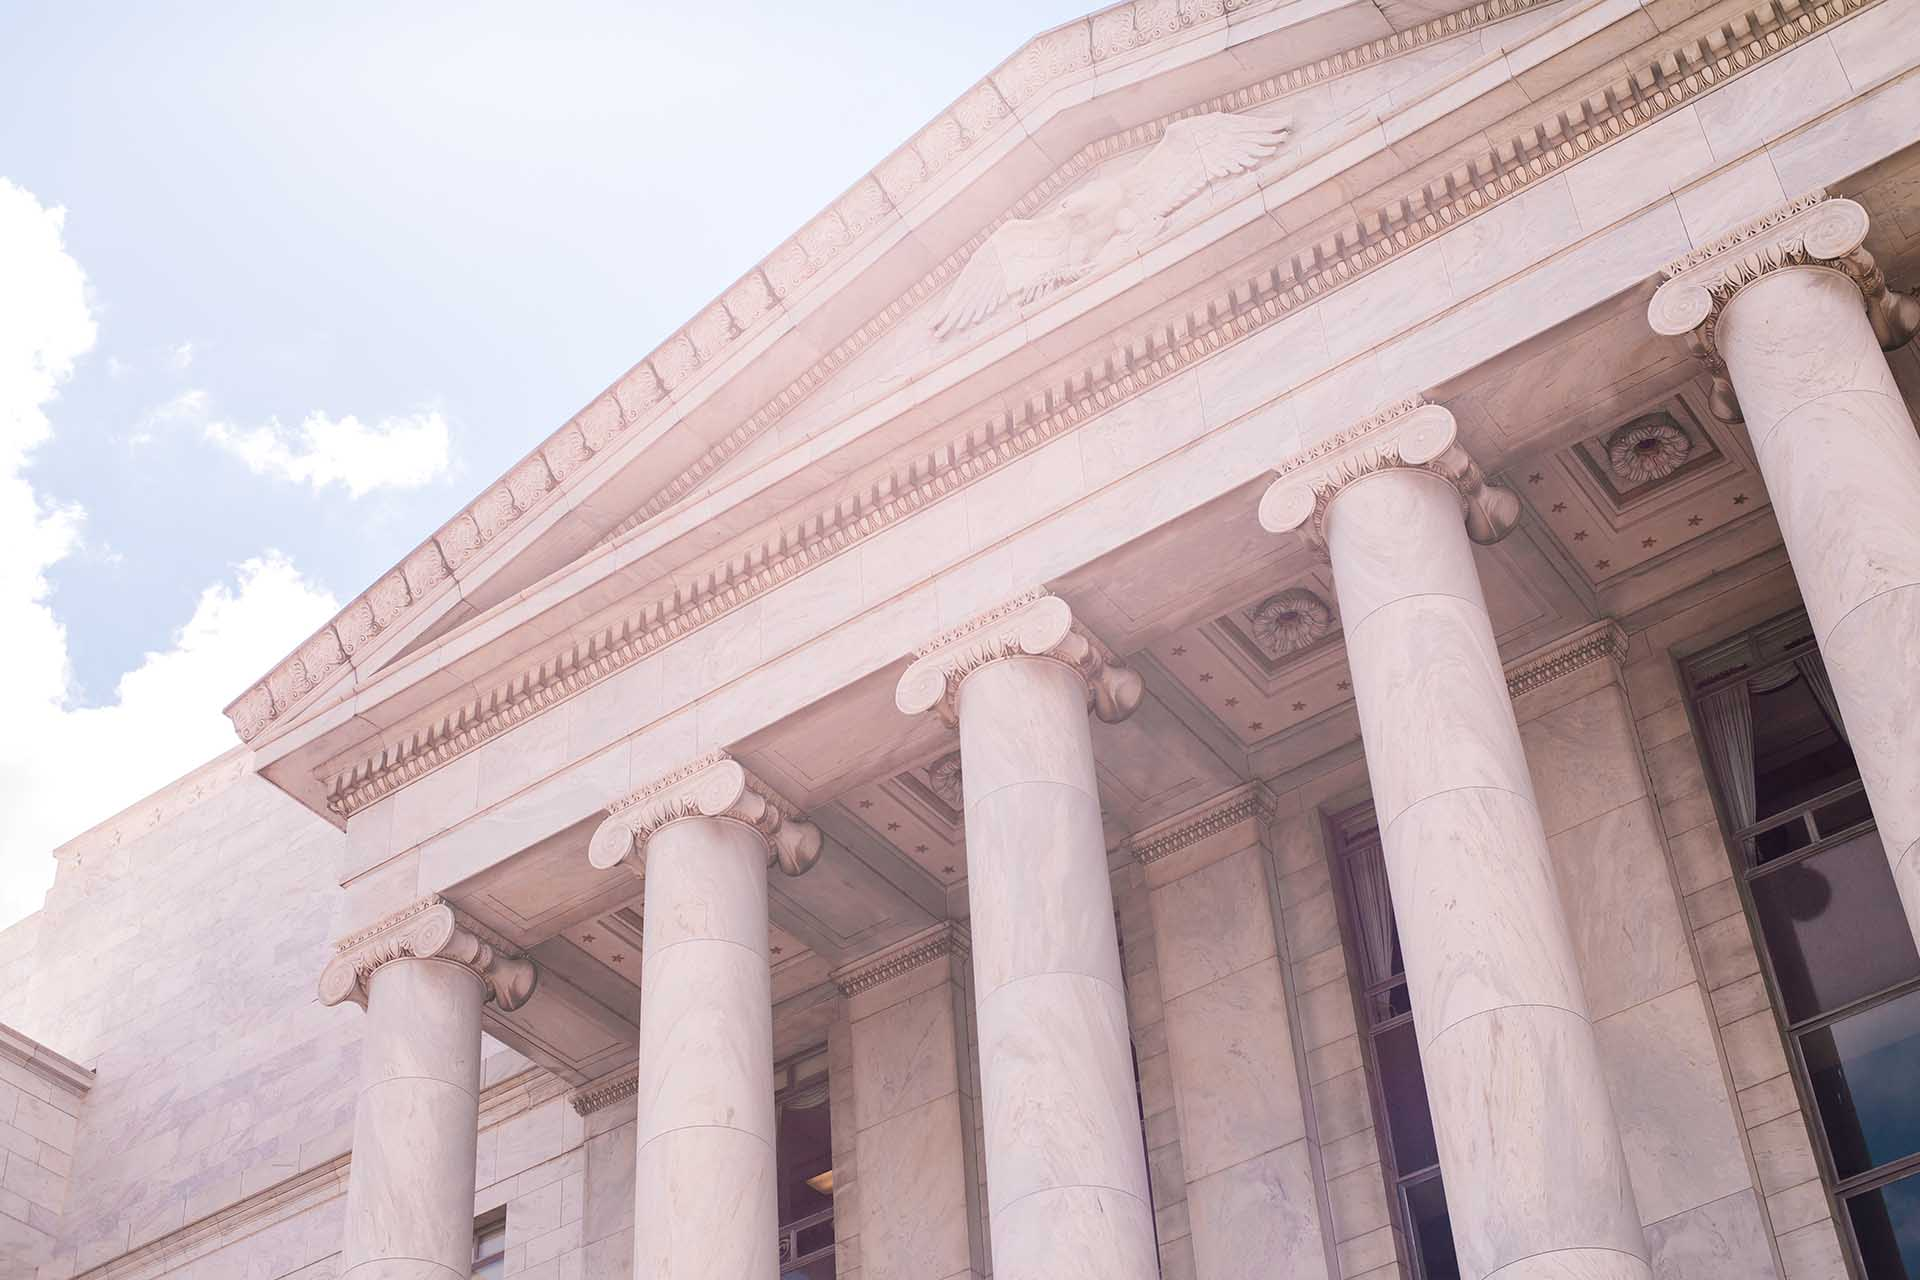 t2informatik Blog: Agile Administration and Local Politics